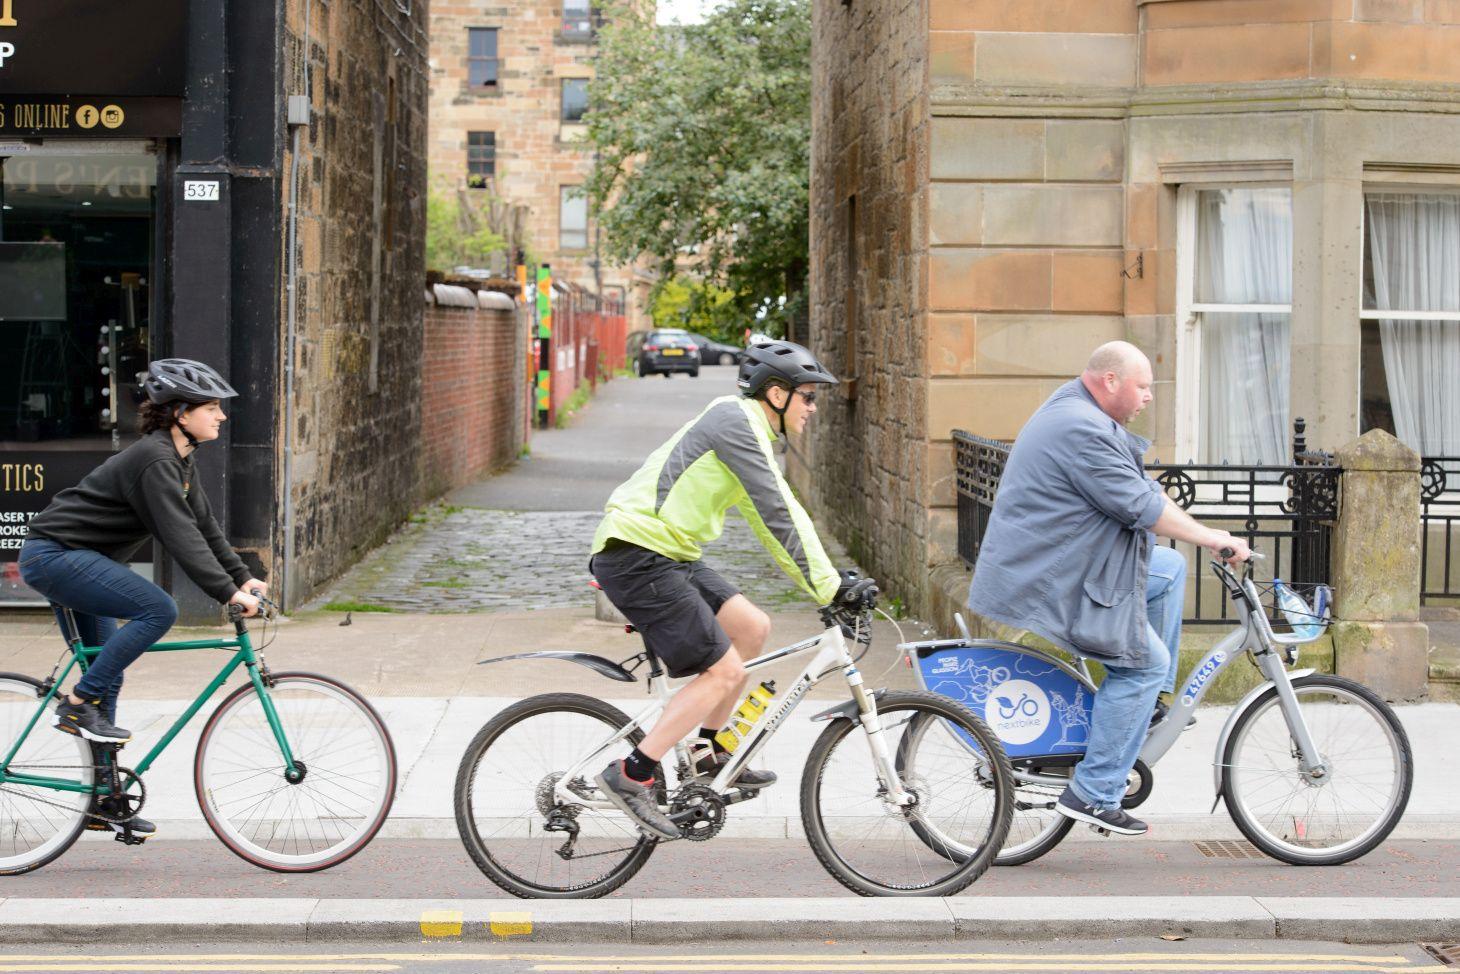 Cyclists on South City Way, Glasgow